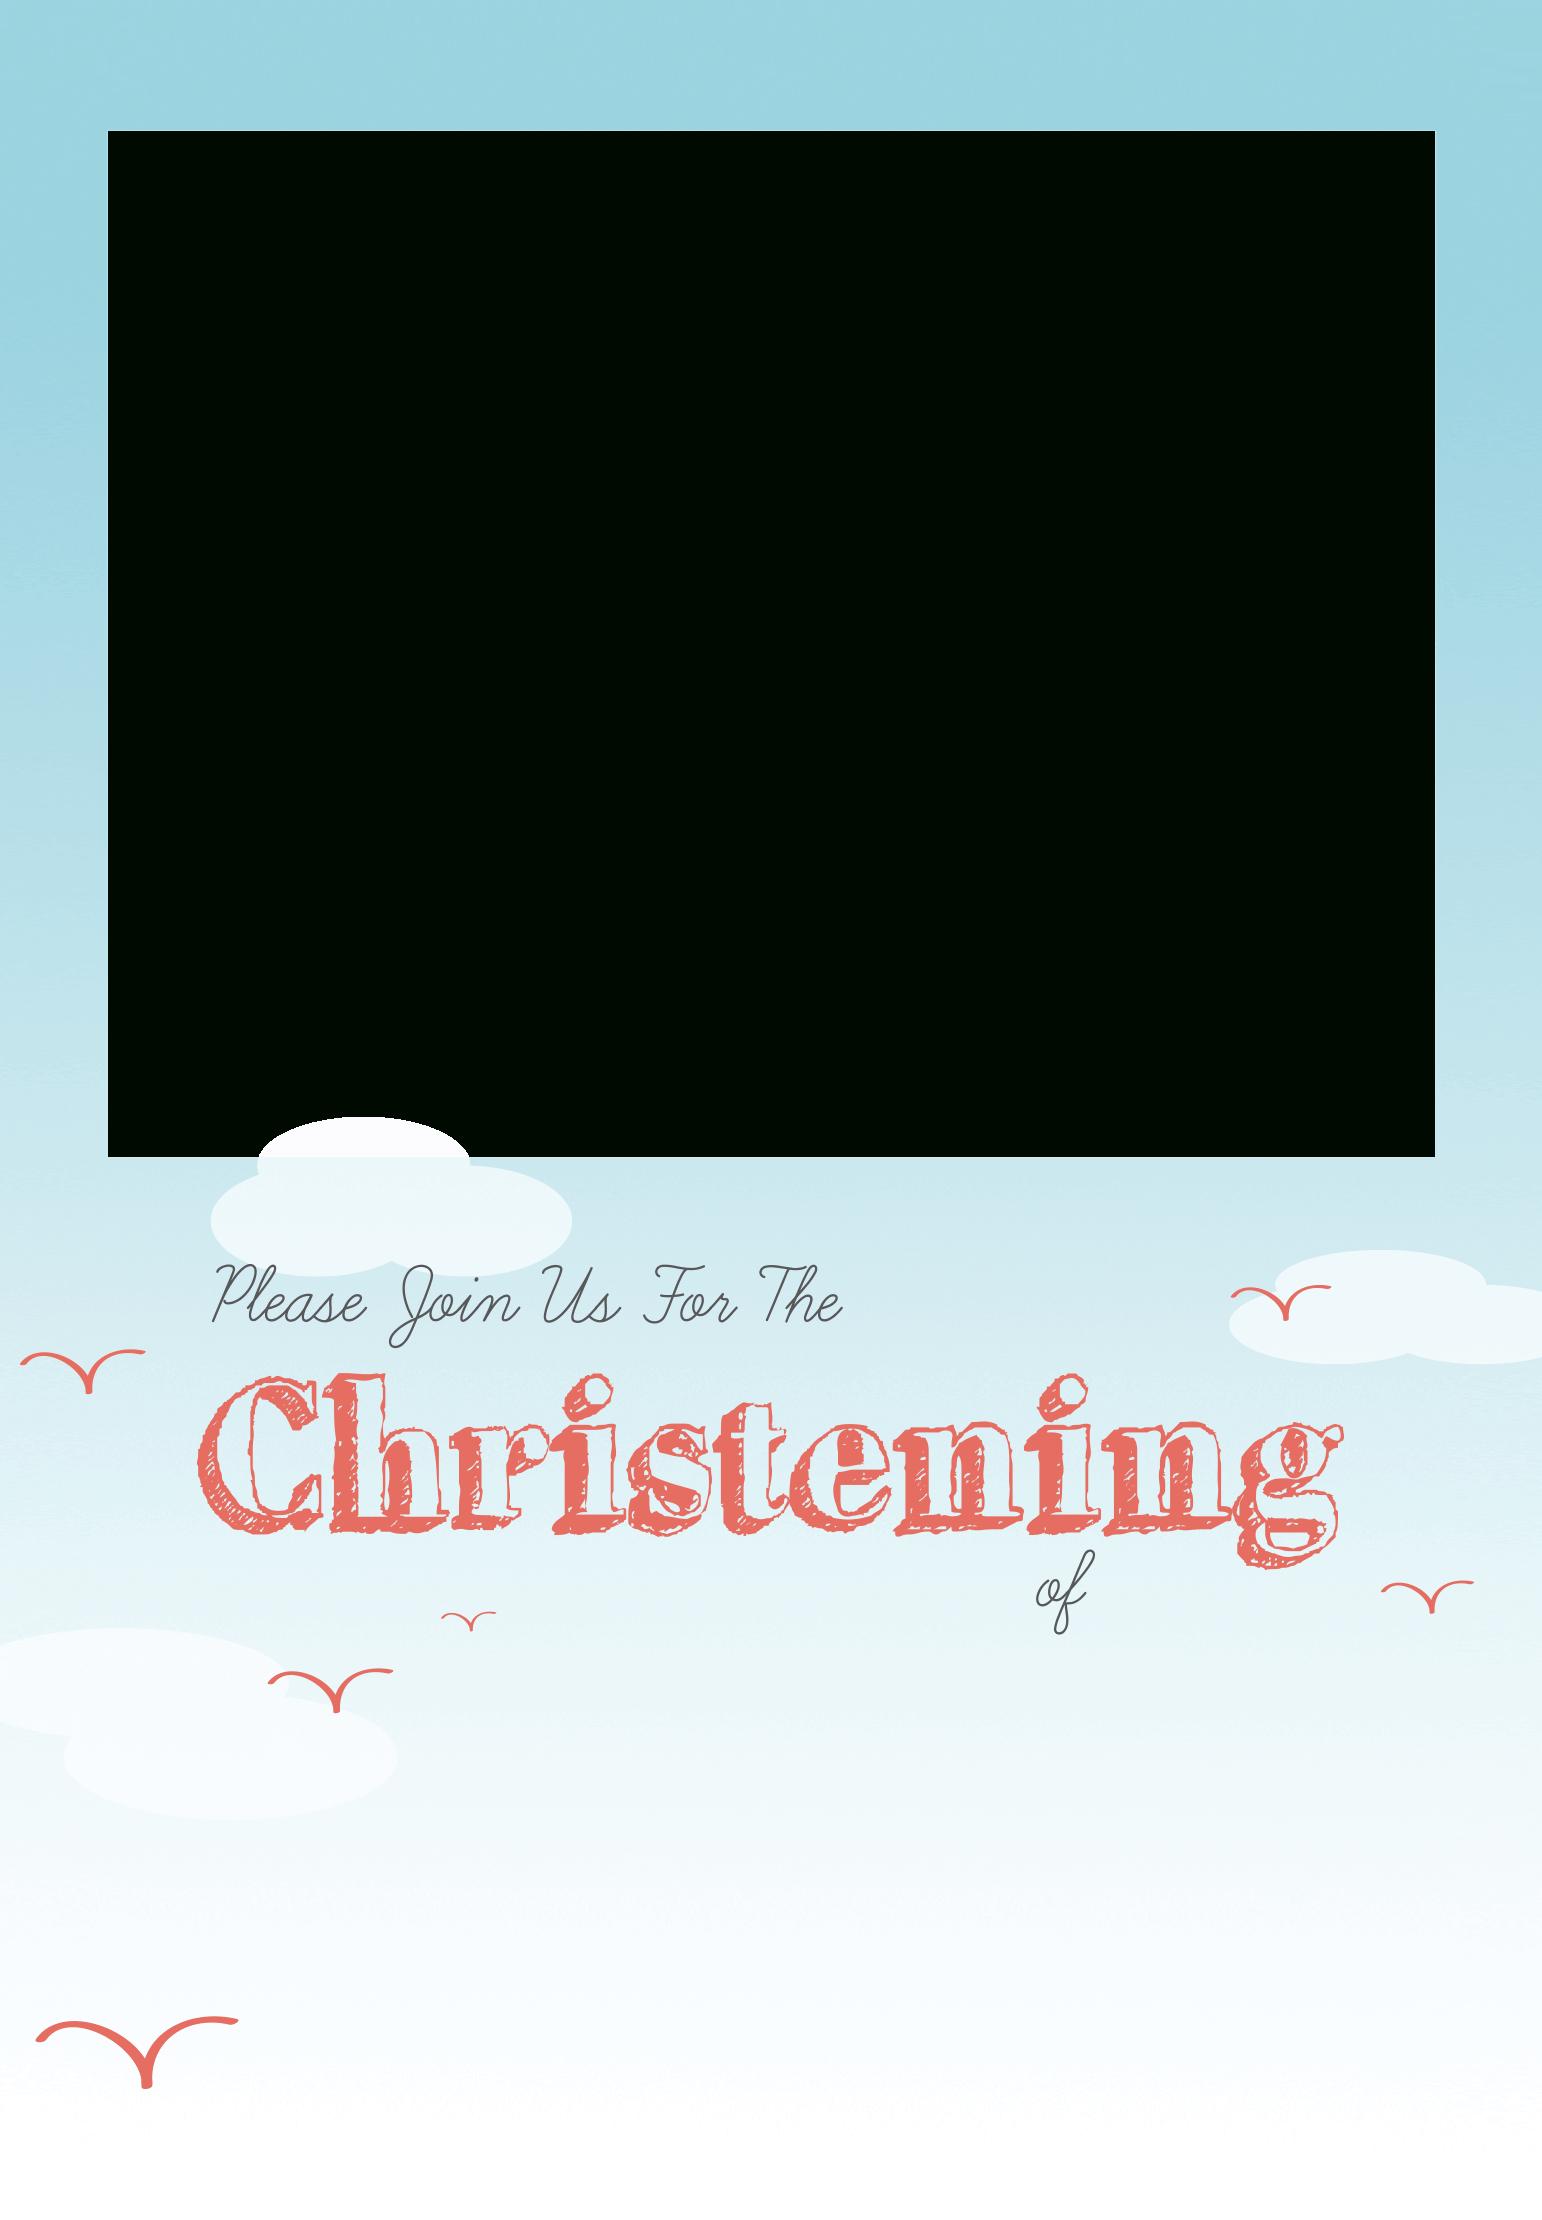 All Smiles - Free Printable Baptism & Christening Invitation - Free Printable Baptism Invitations